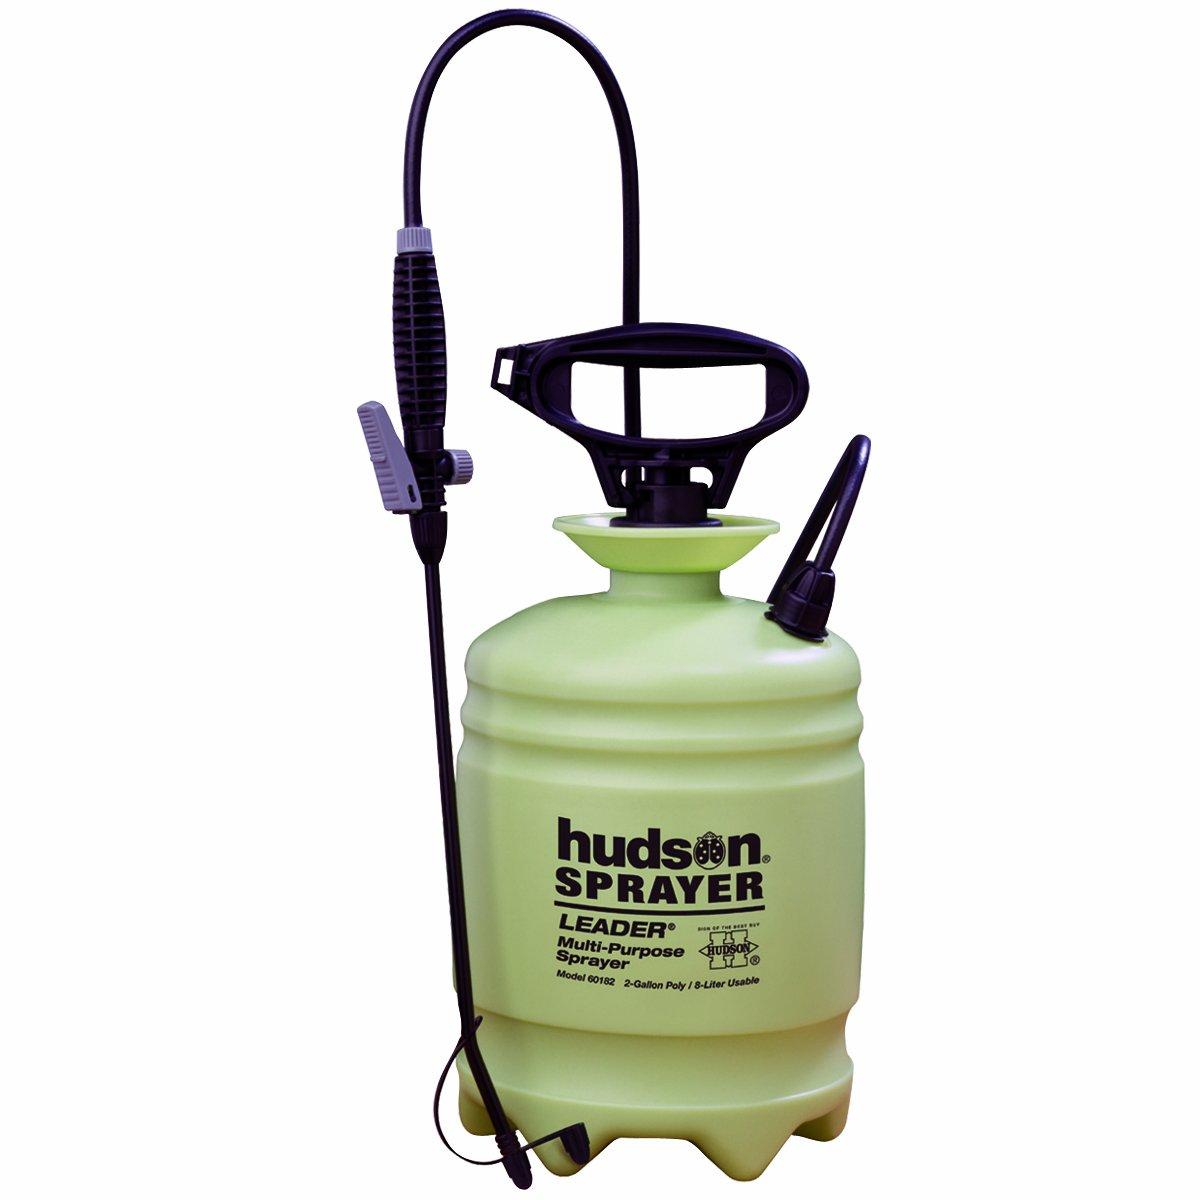 Hudson 60182 Leader 2 Gallon Sprayer Poly